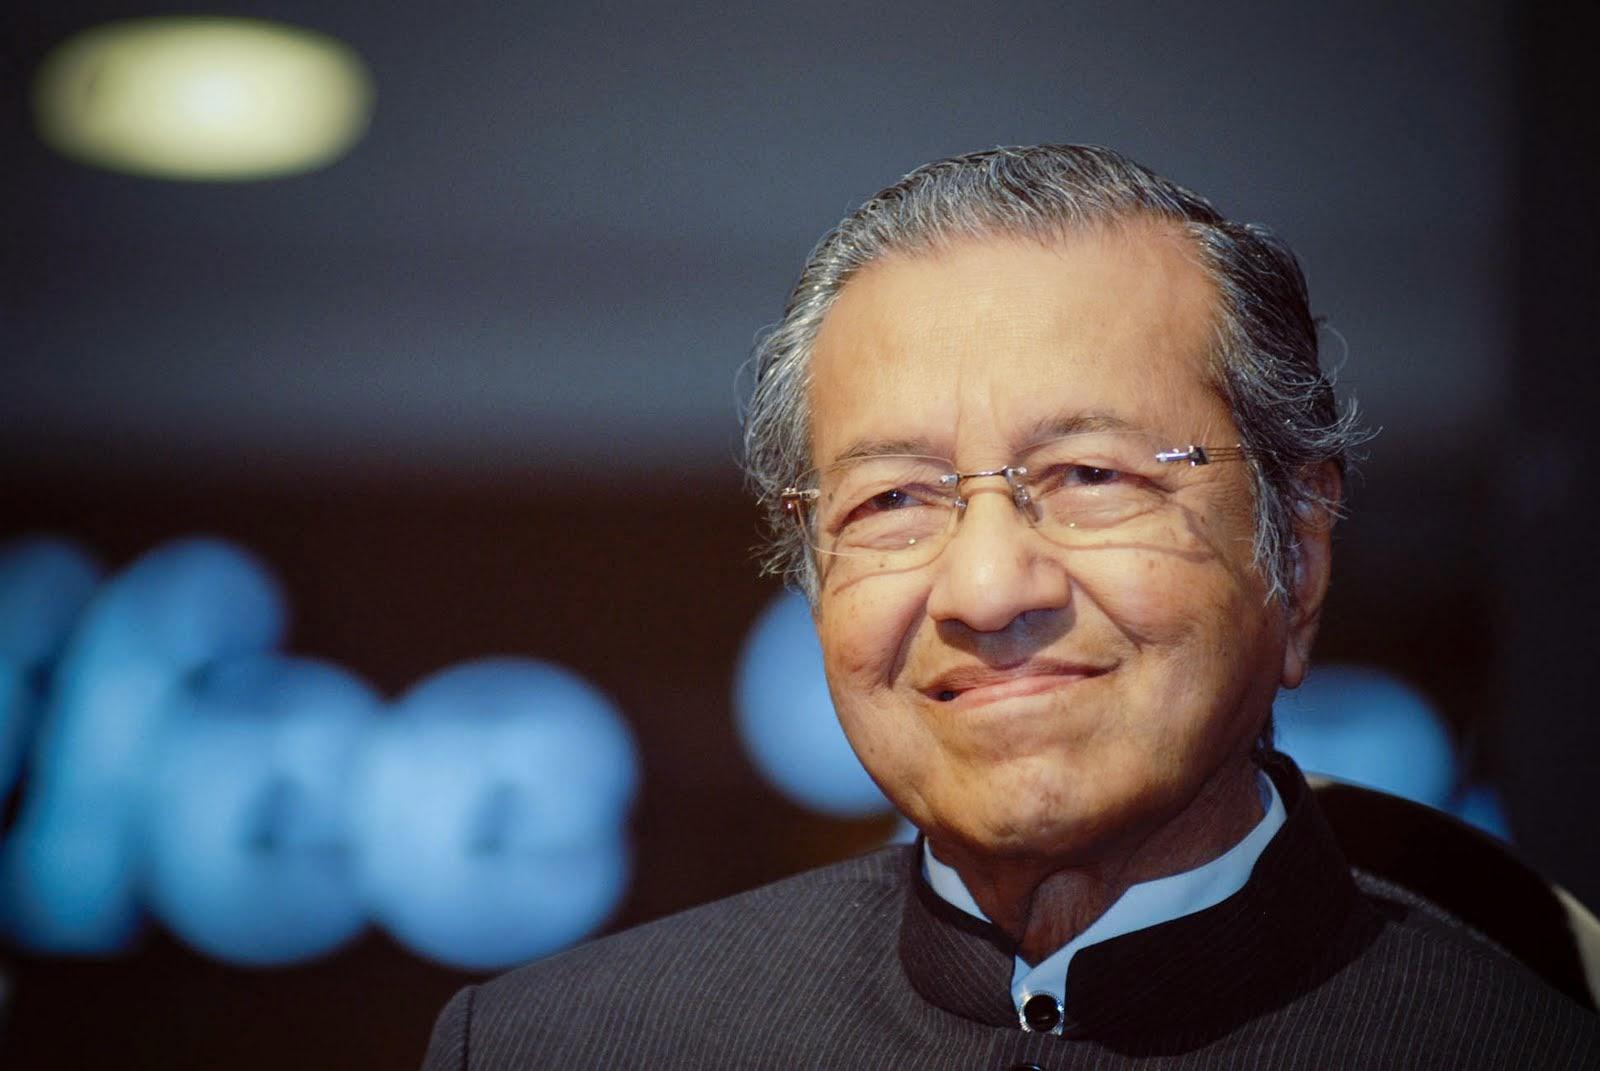 For e.g. Tun Dr. Mahathir bin Mohamad. Image Credit: Inspirasi Remaja Kini